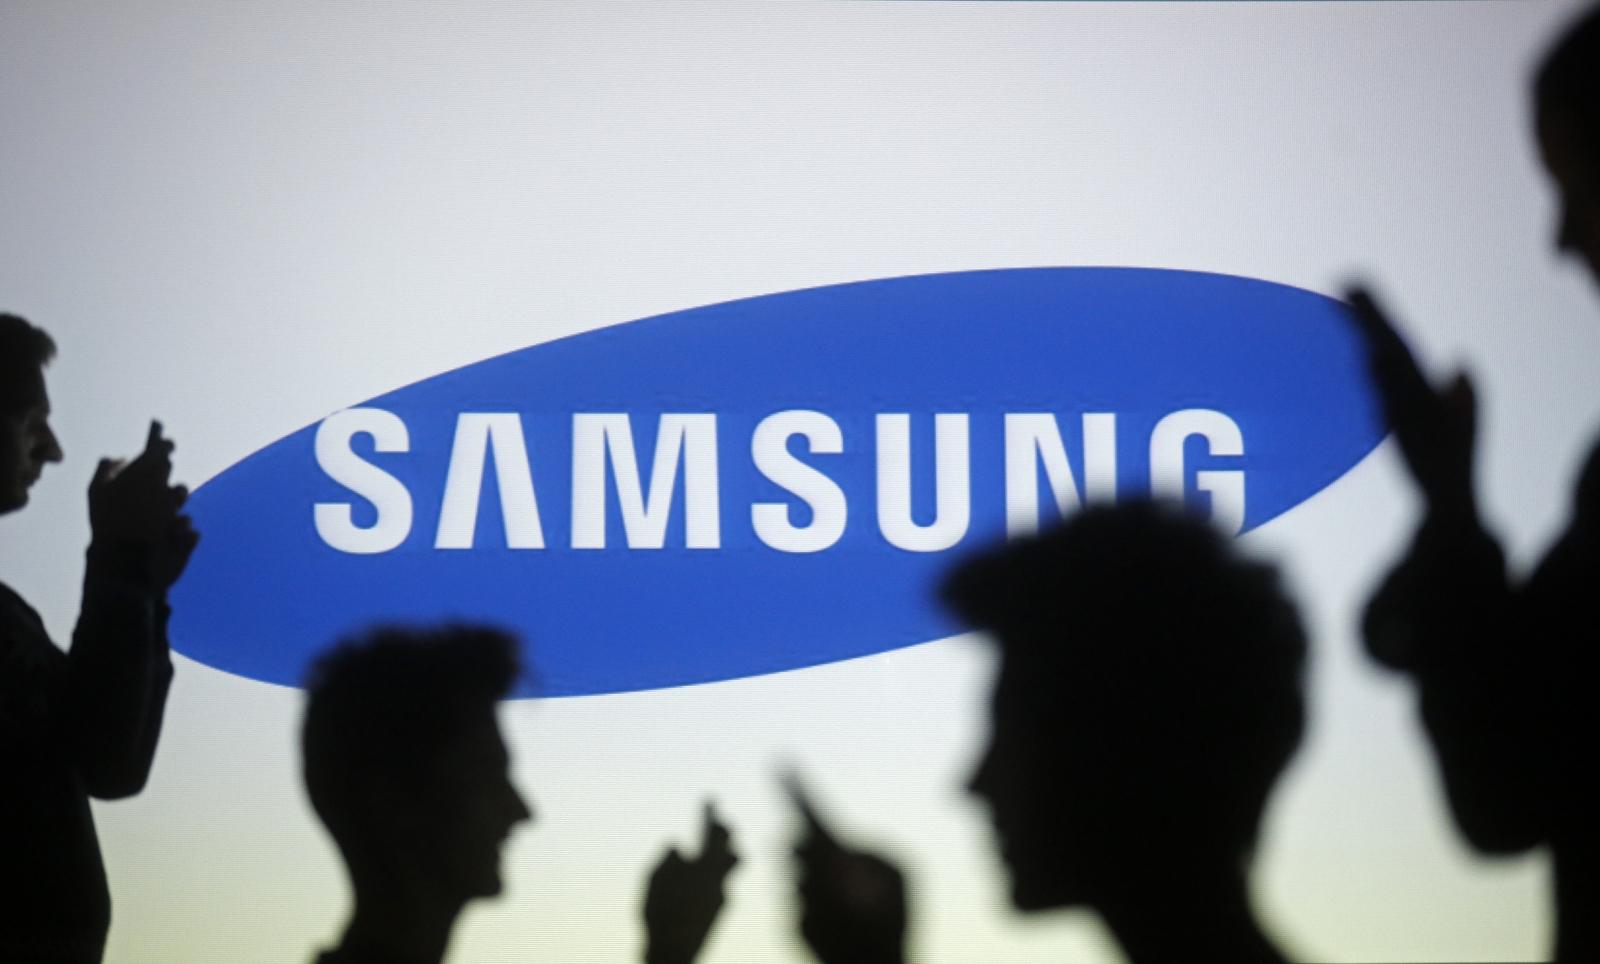 Galaxy S6 will use Samsung's own Exynos 7 64-bit chip